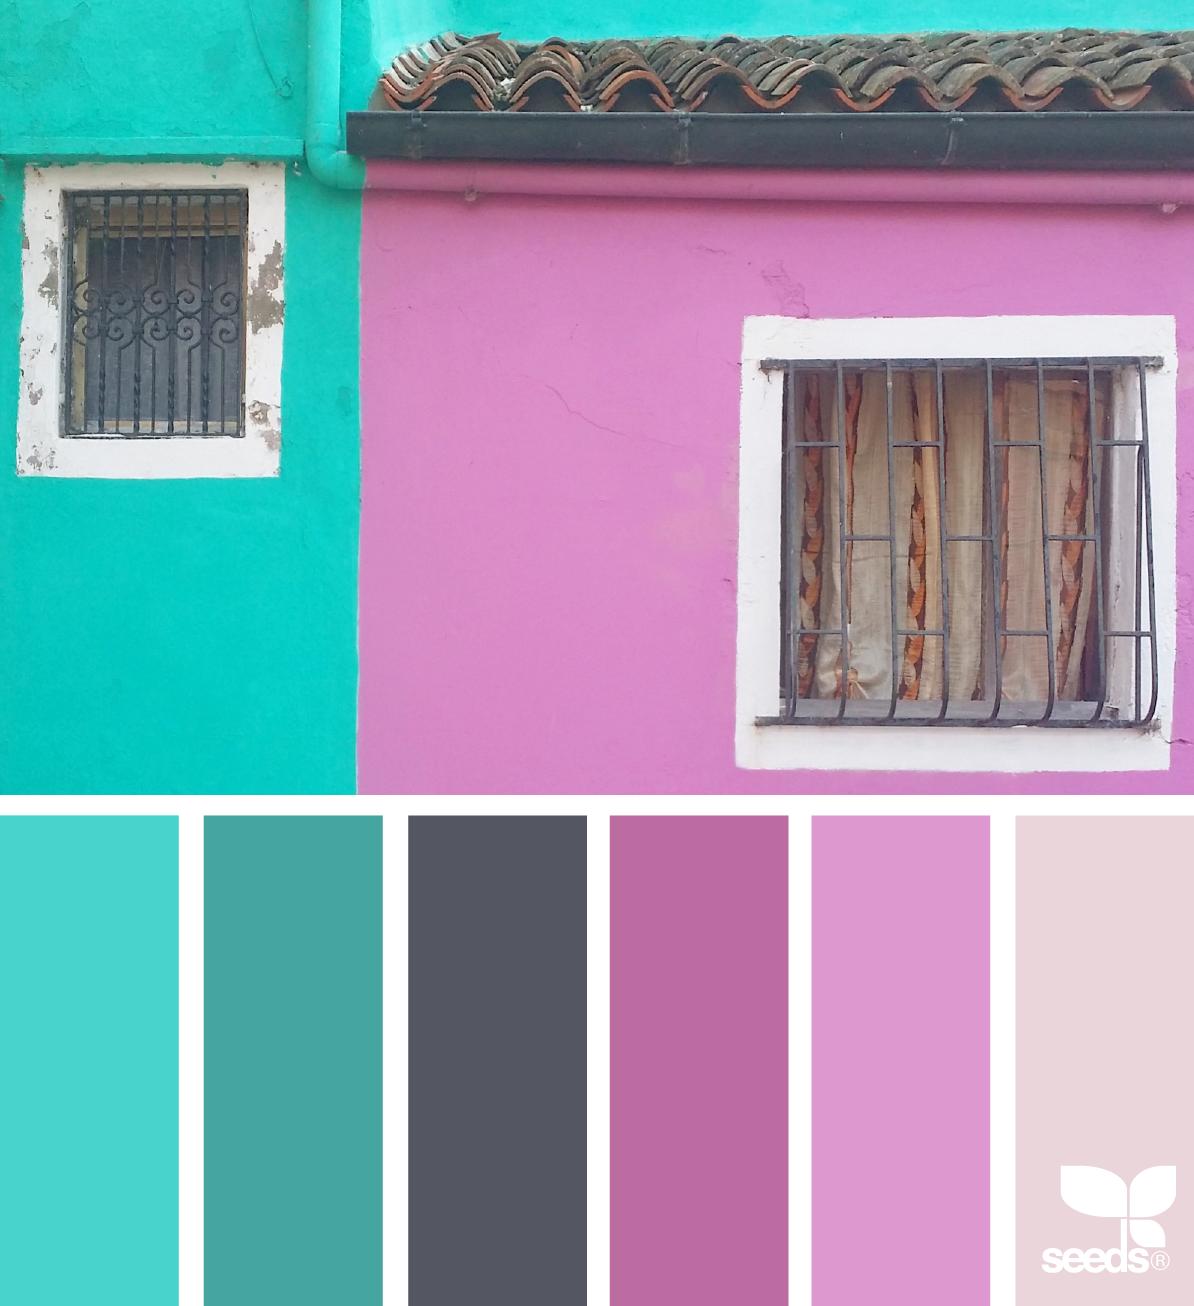 Color View | inspiration is bliss | Pinterest | Design seeds, Color ...